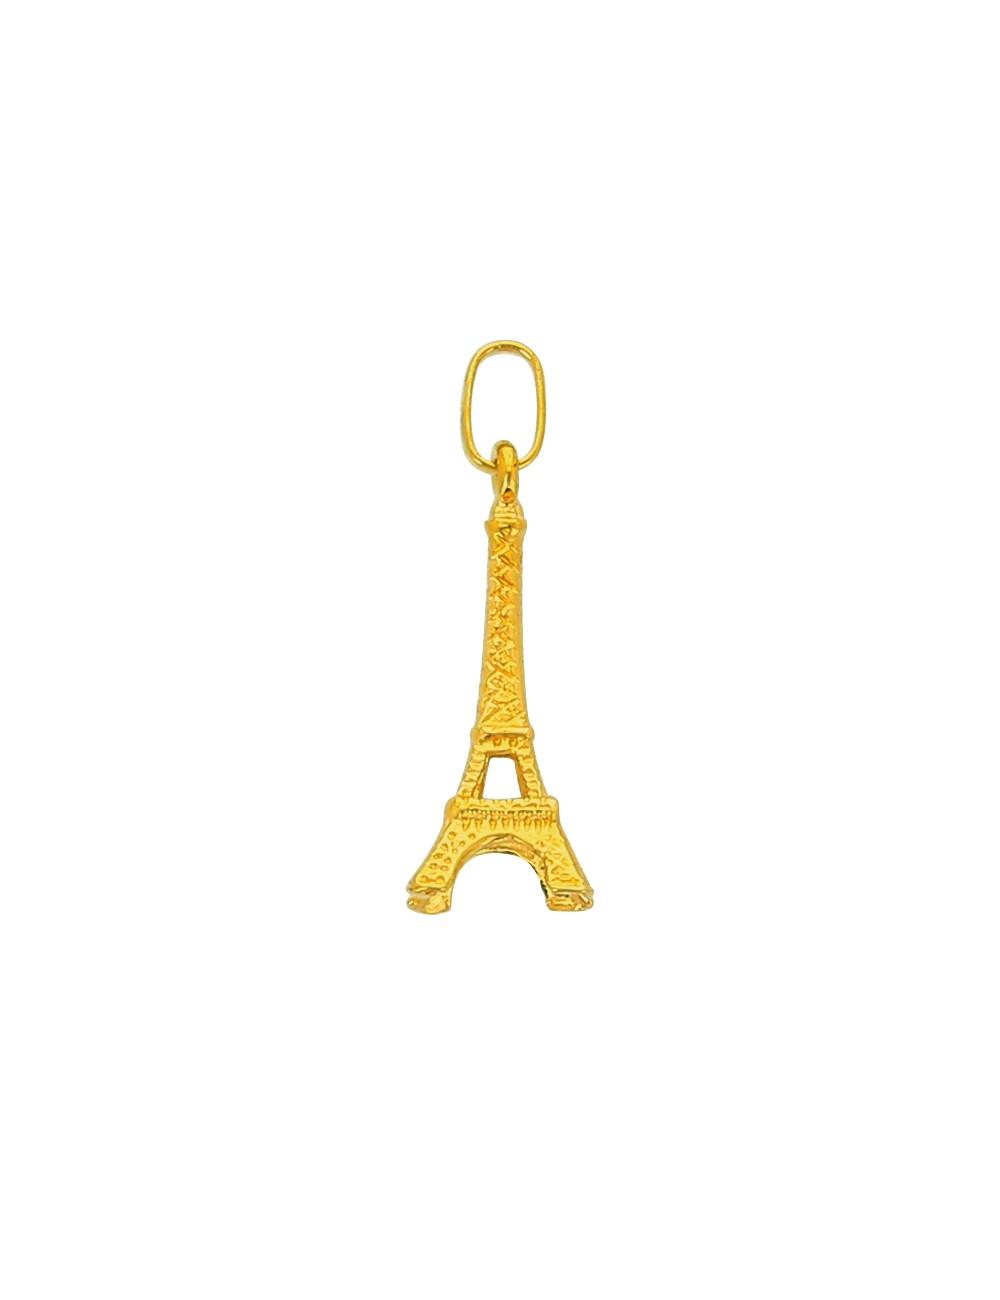 Pendentif Tour Eiffel Or Jaune 18 Carats + Chaine Or Jaune Offerte